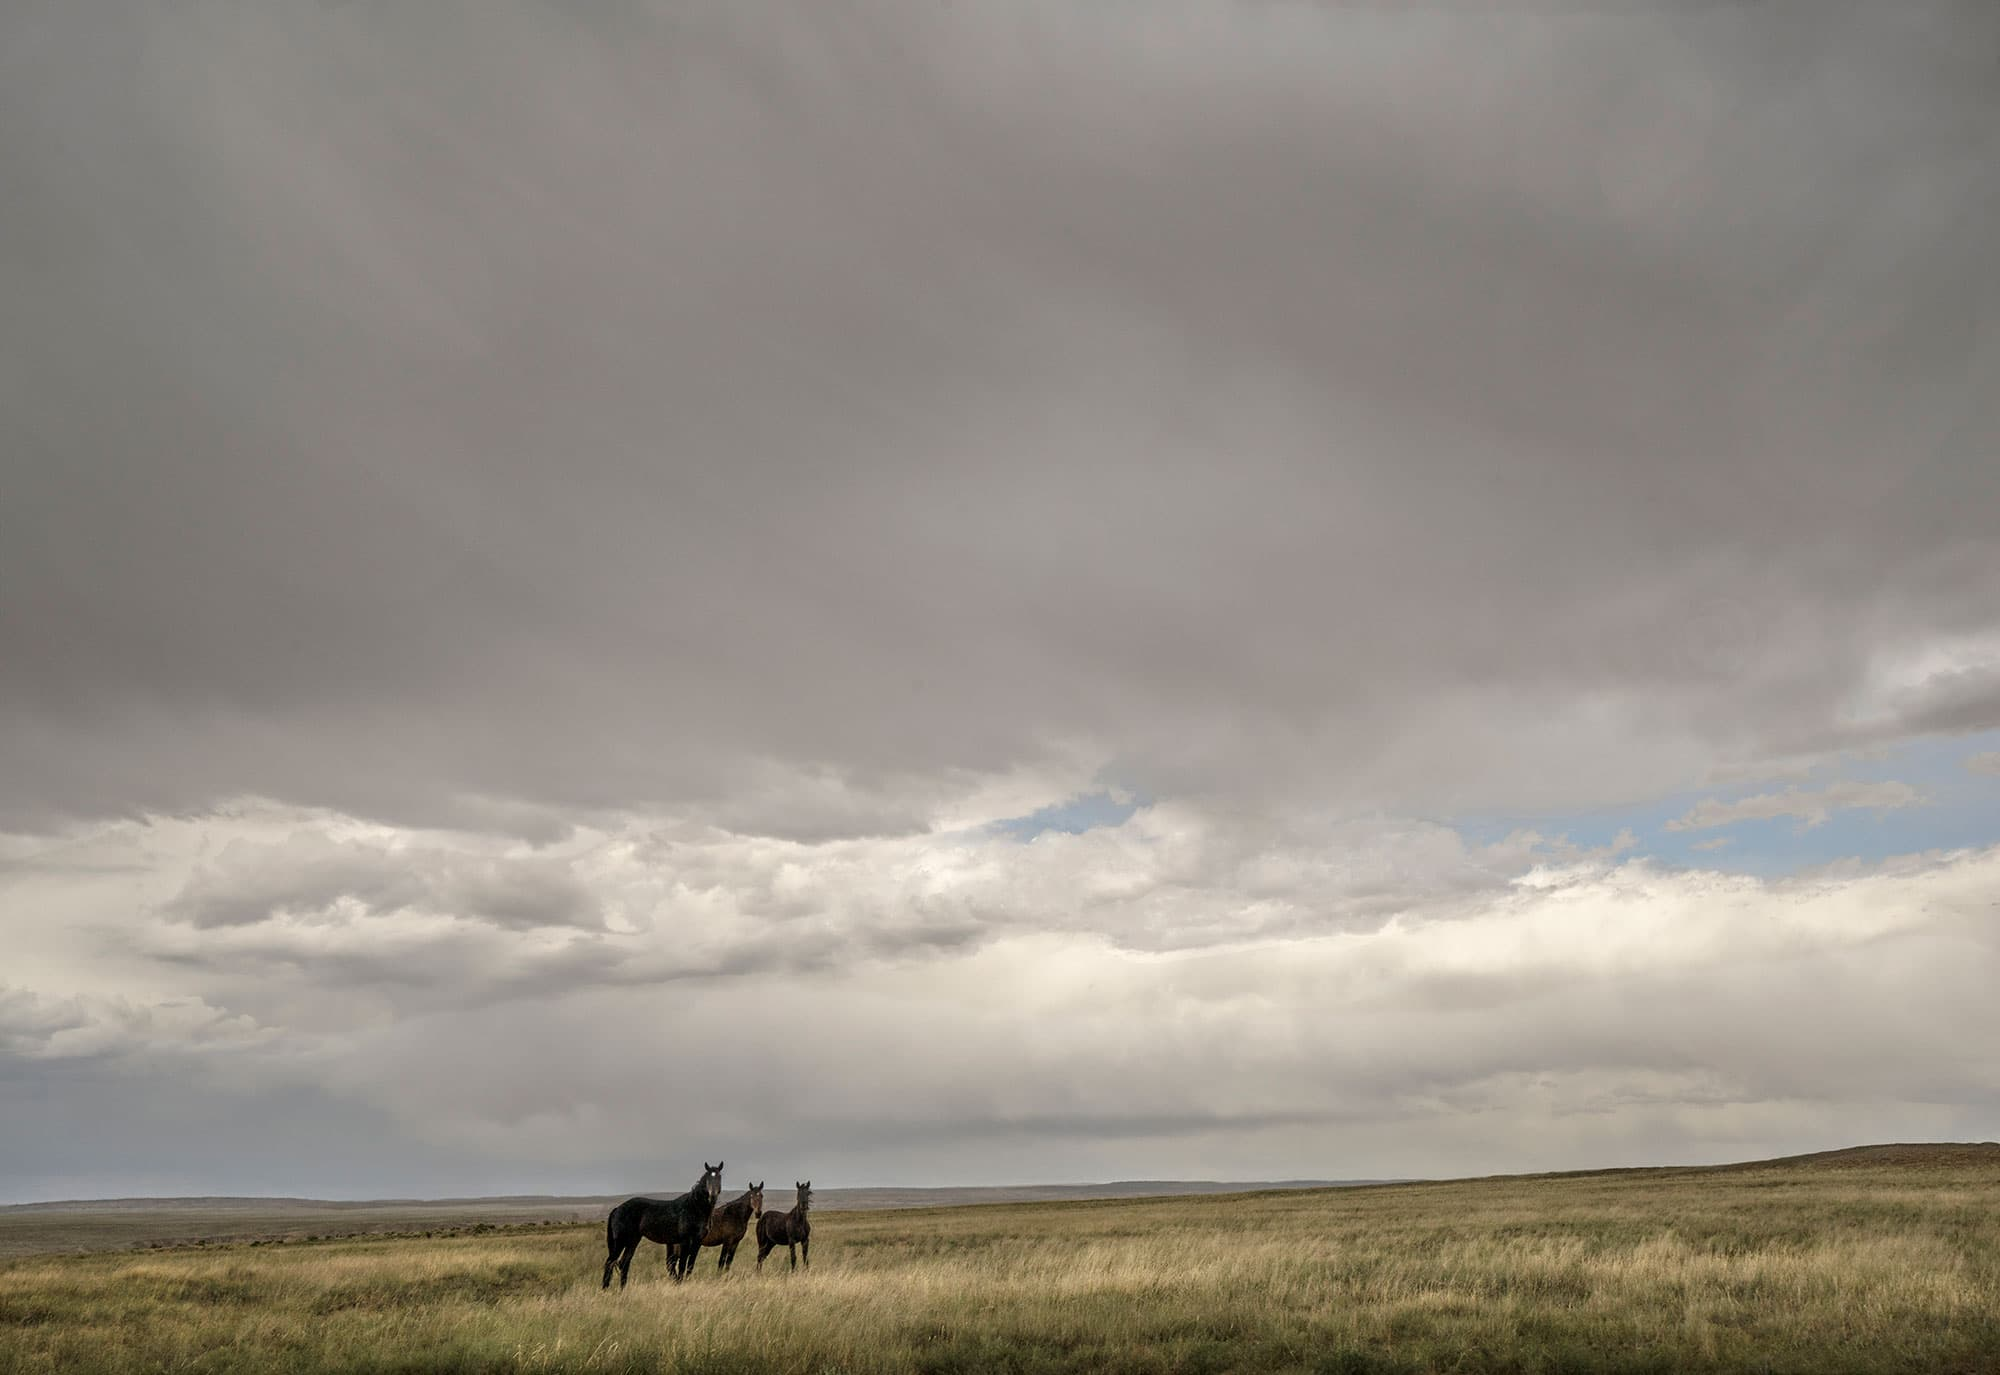 9-Horses-New-Mexico-2019-arthur-lazar